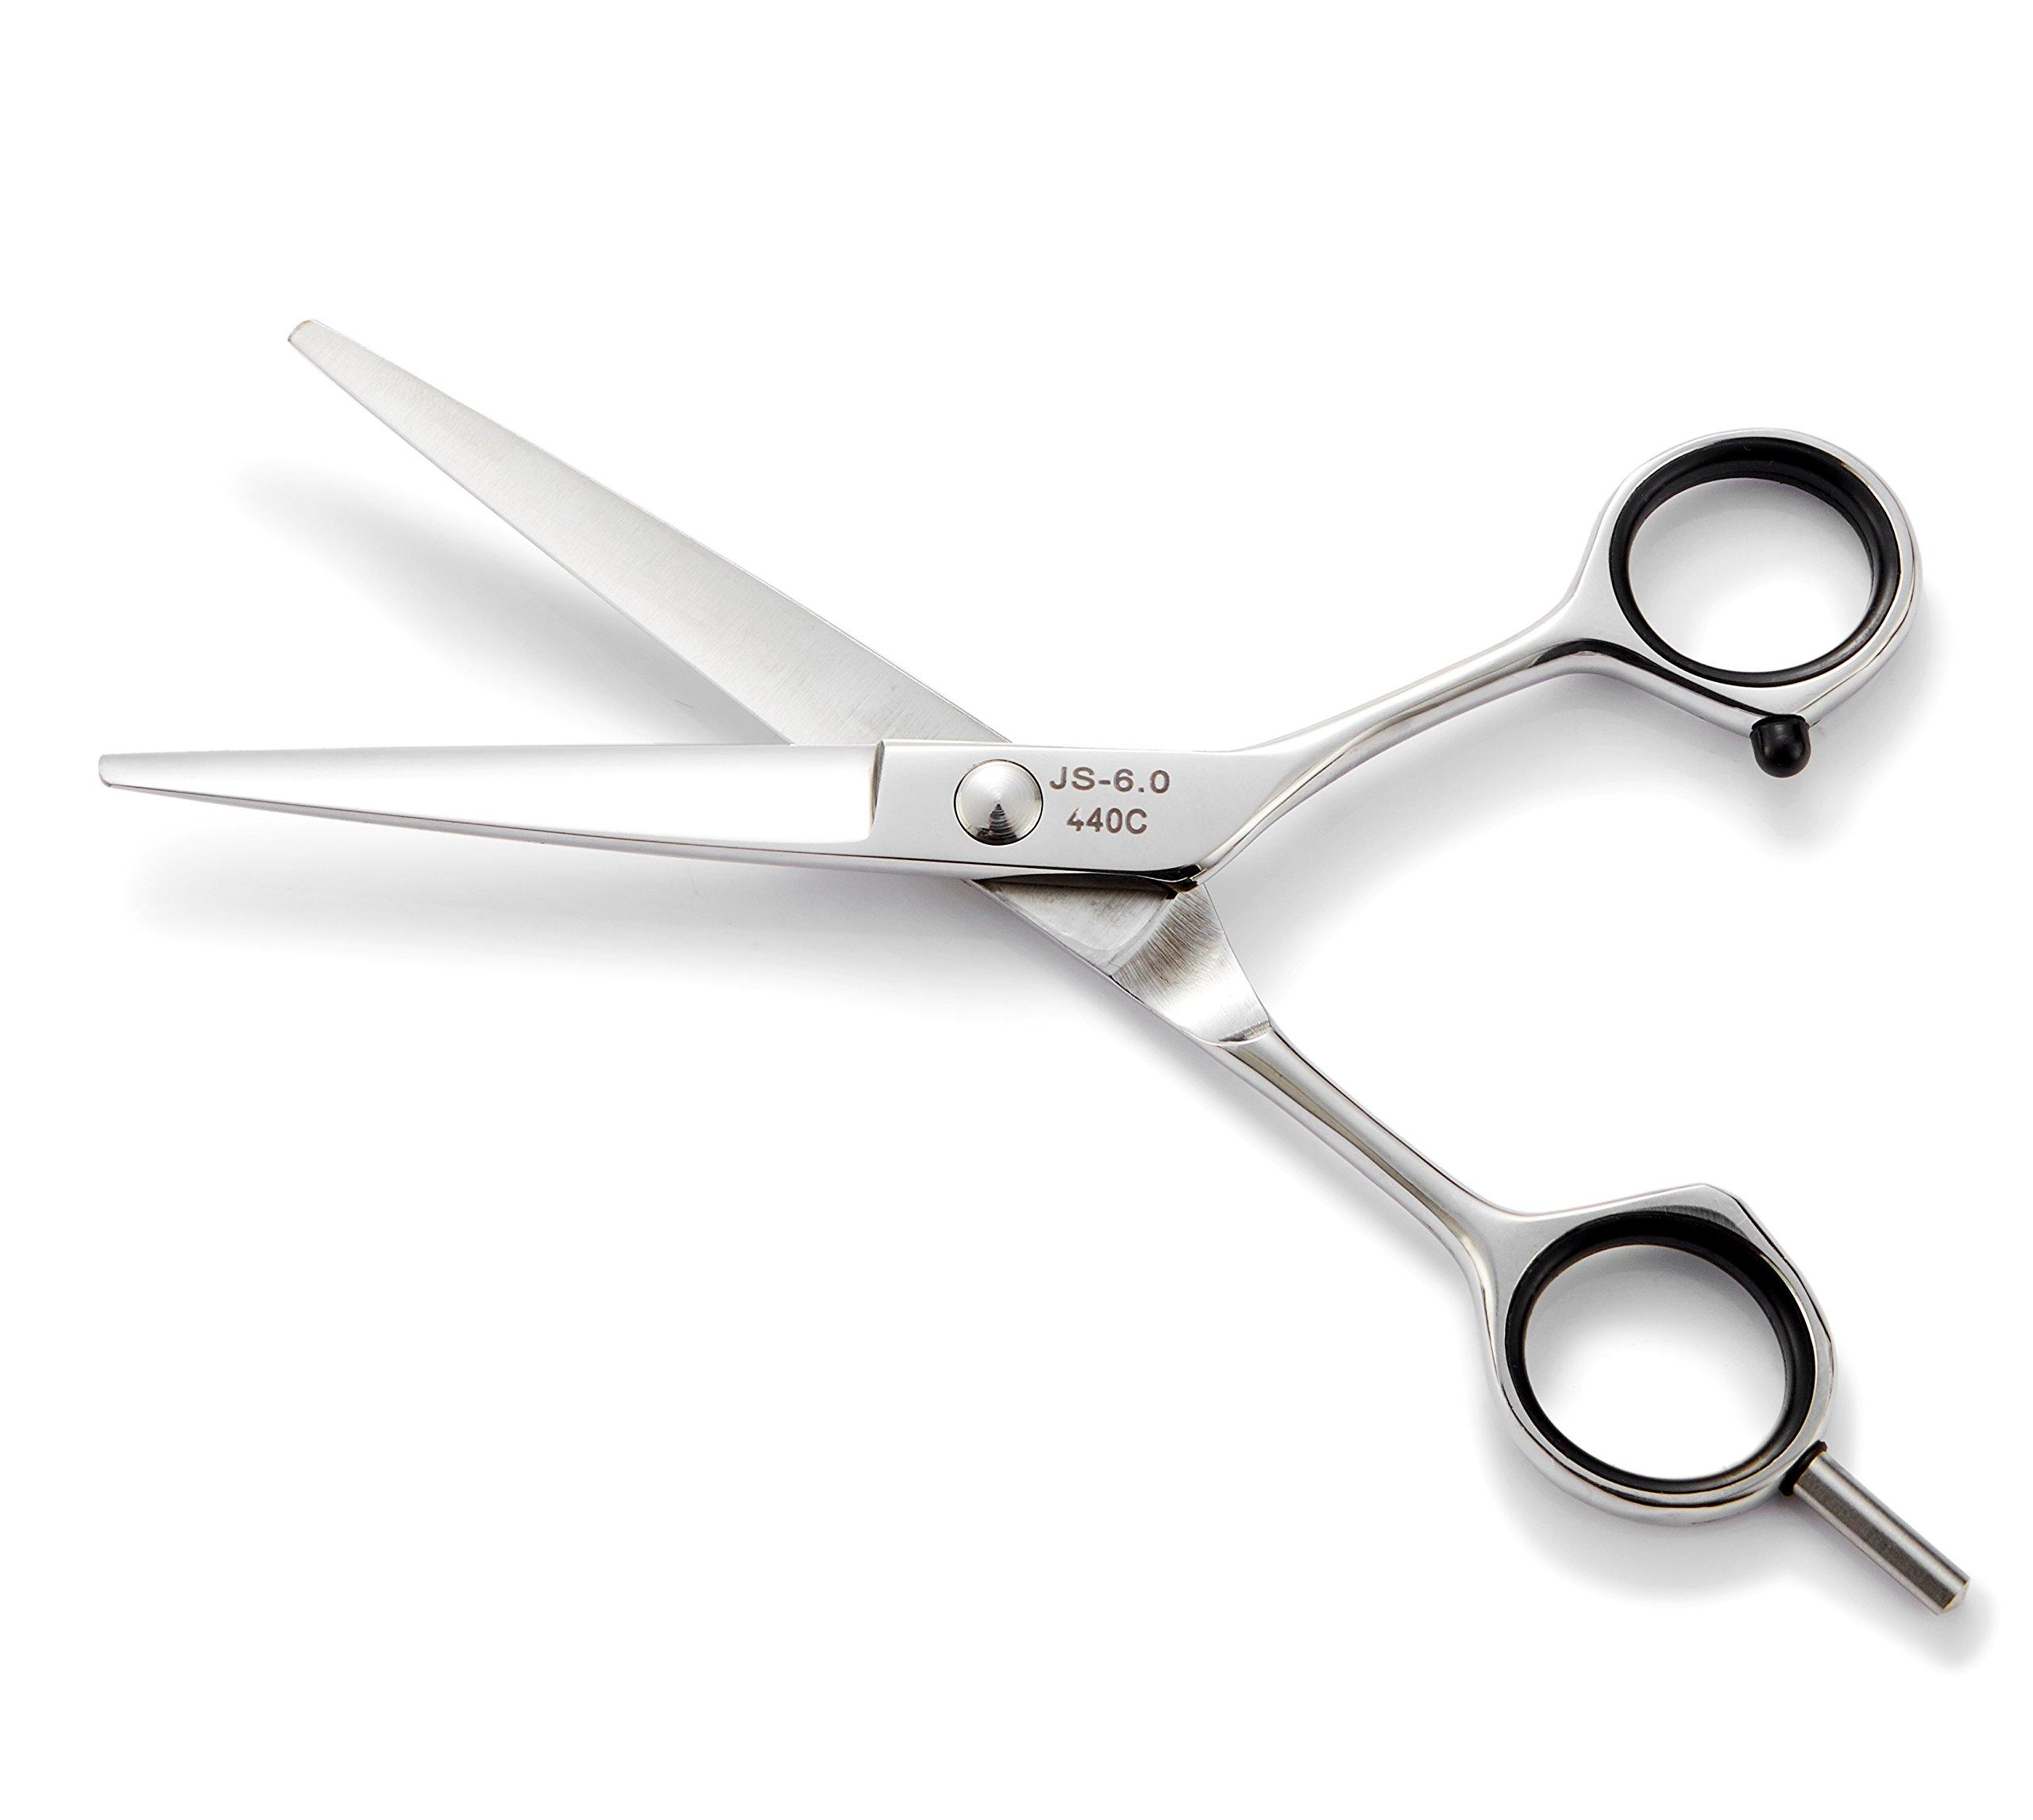 2018 Professional Hair Cutting Scissors Set,Japanese 6.5 Inch Hair Scissors Teflon Shears Hairdressing Scissors Barber Thinning Scissors Hairdresser Razor Edge Haircut Right hand use by JAVENPROLIU (Image #8)